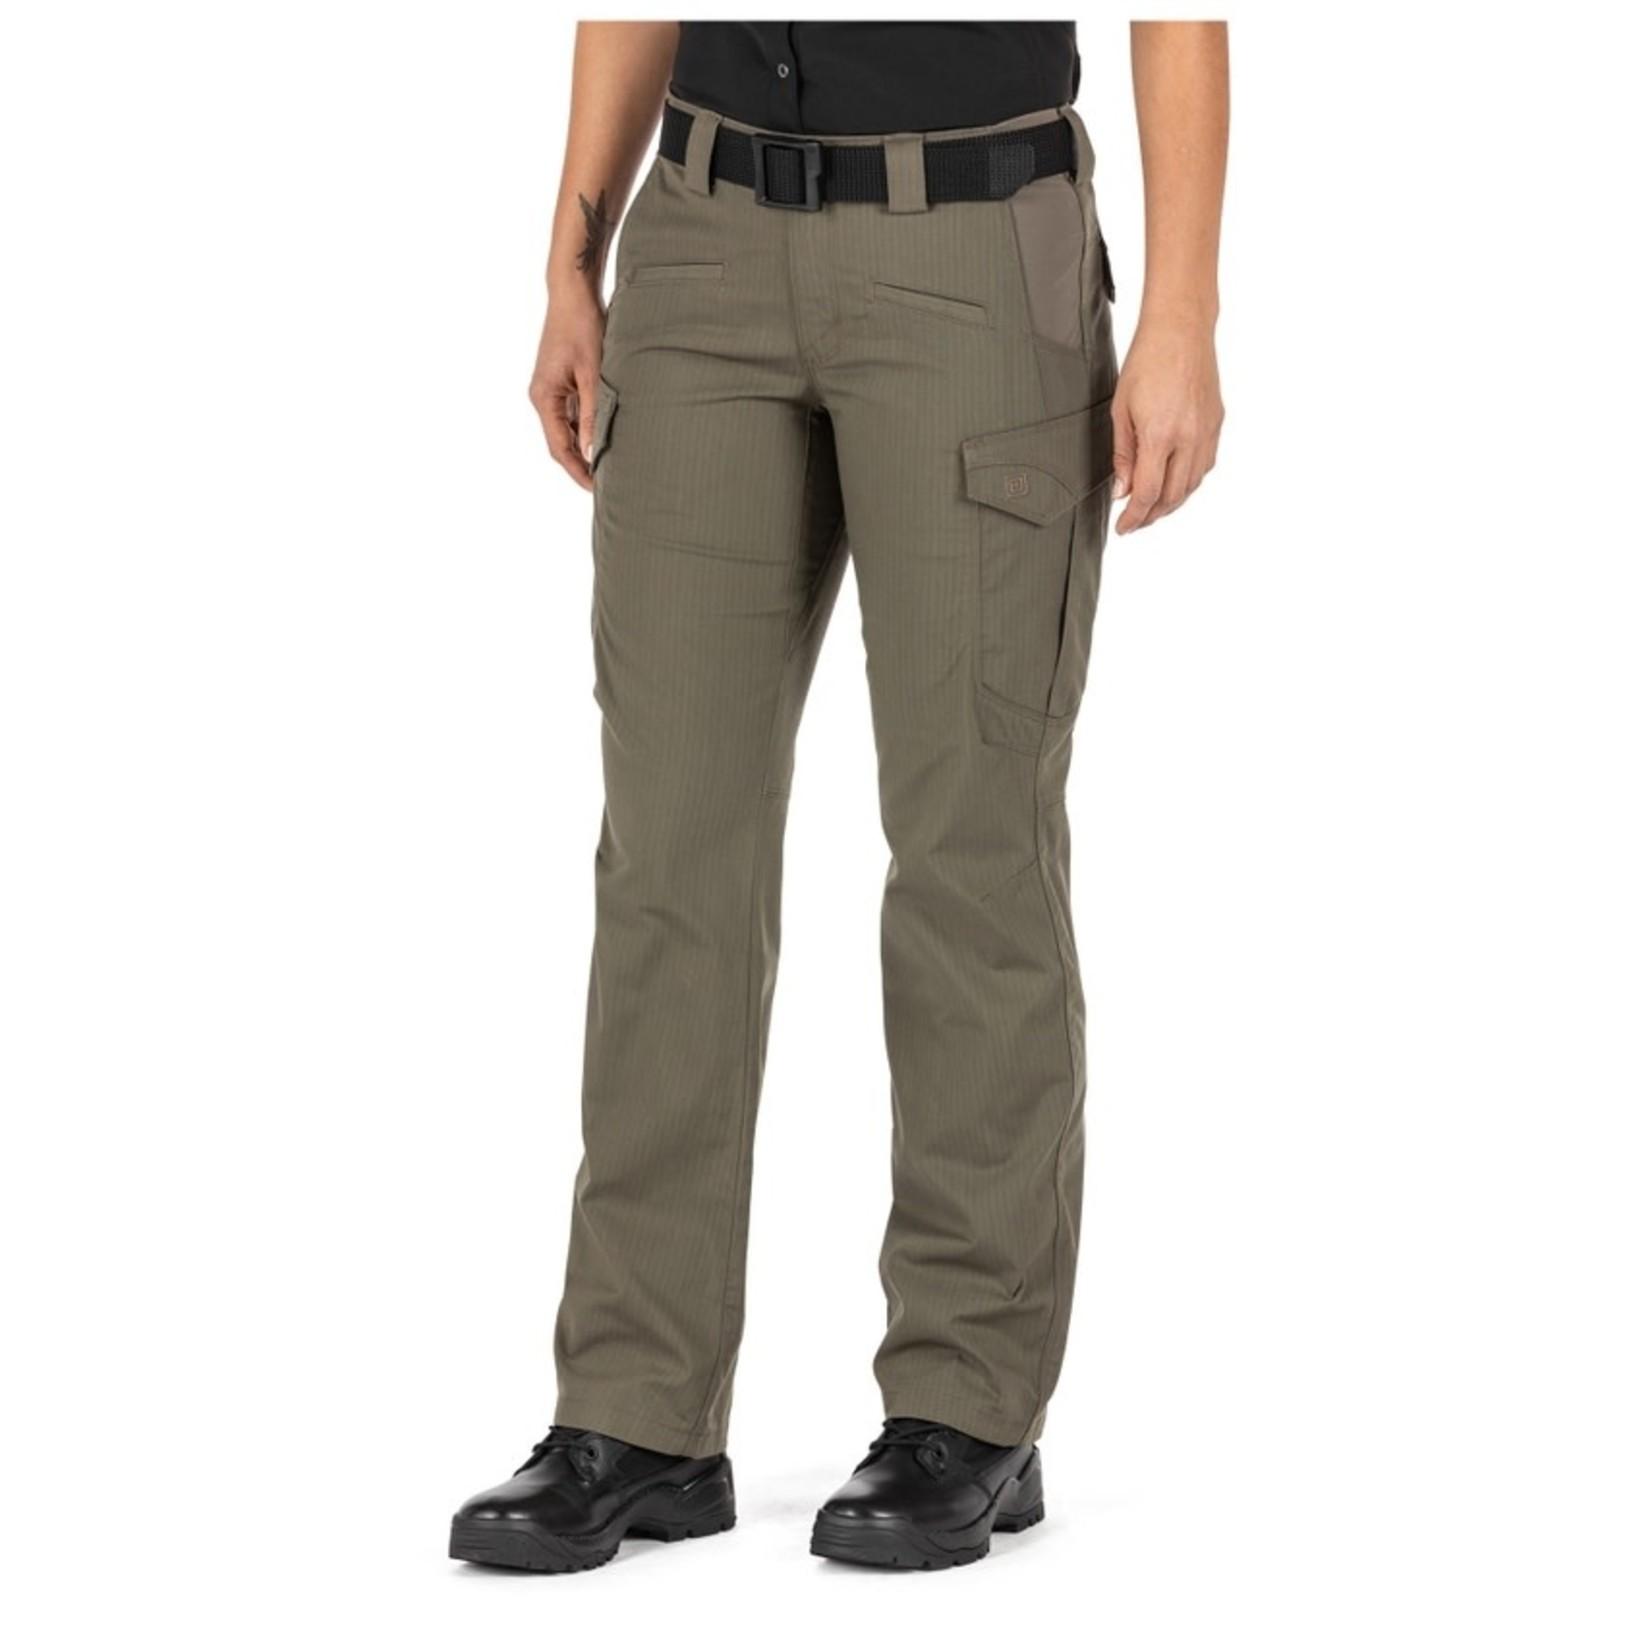 5.11 Tactical 5.11 Women's Icon Pants